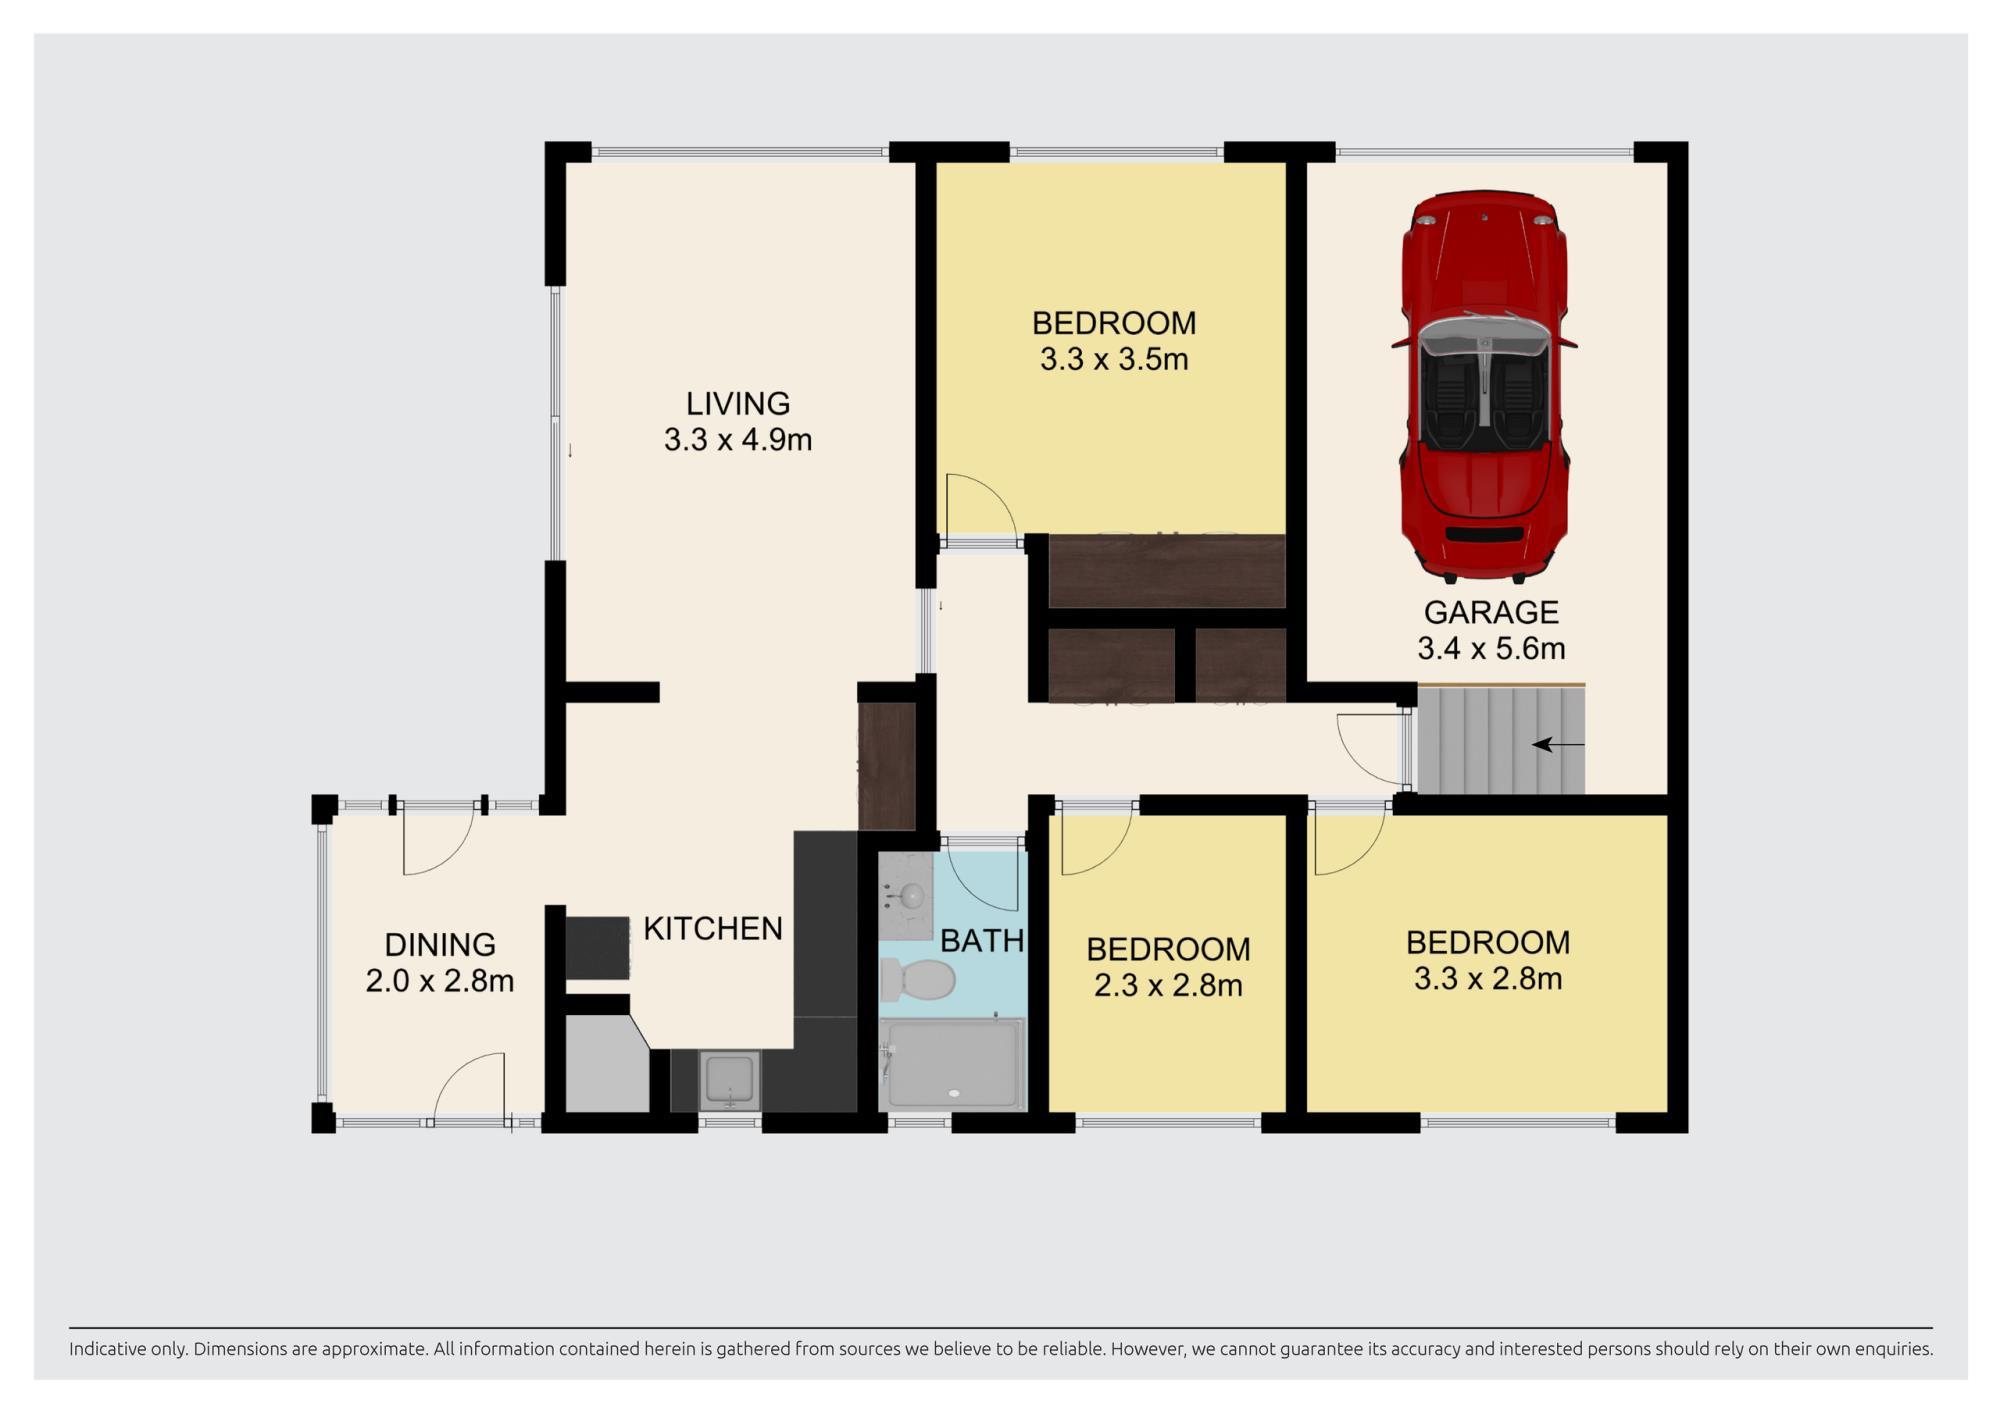 41A Reeves Road Pakurangaproperty floorplan image